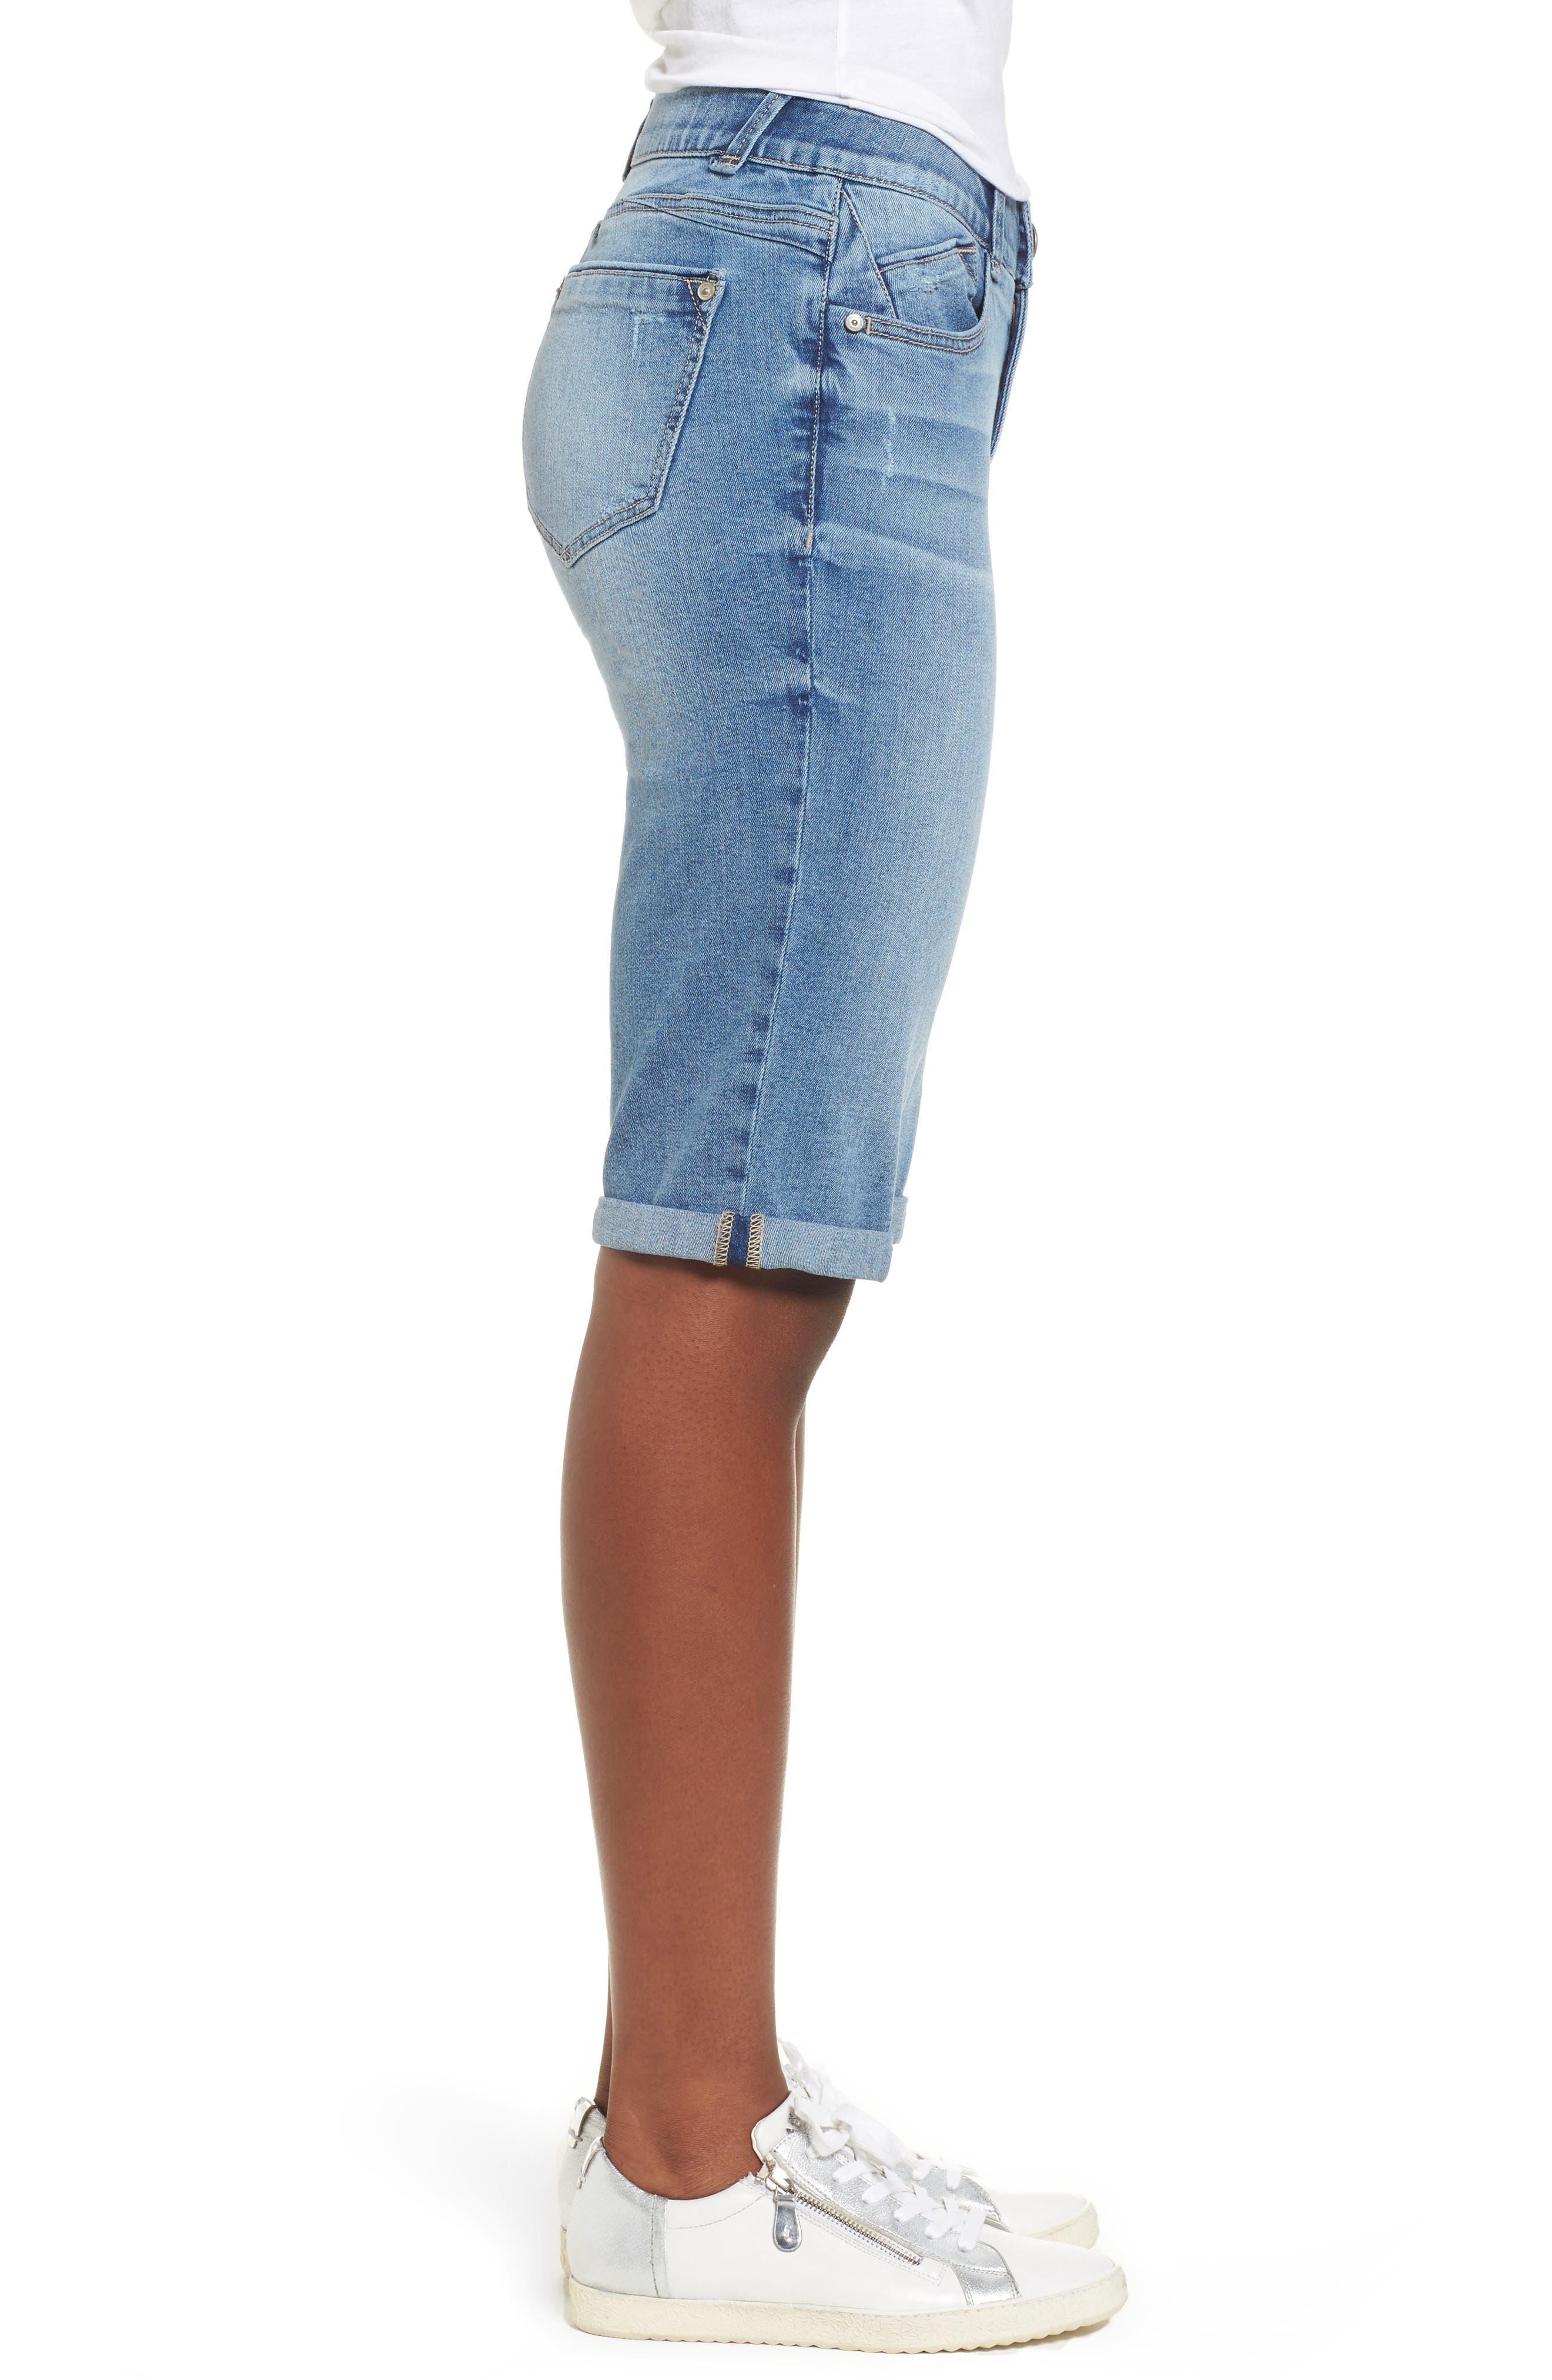 Ab-solution Cuffed Denim Shorts,                             Alternate thumbnail 3, color,                             LIGHT BLUE